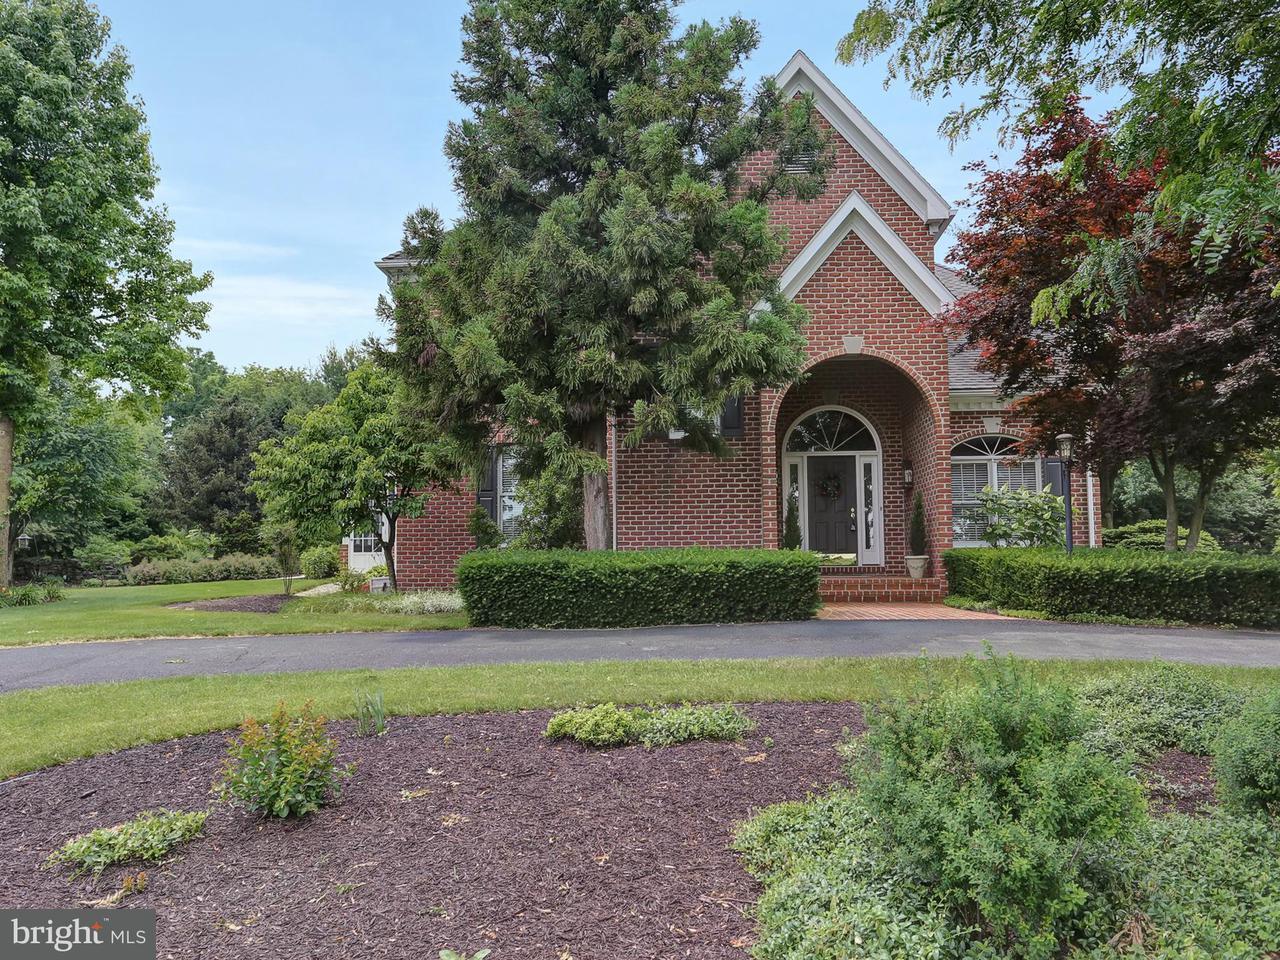 獨棟家庭住宅 為 出售 在 308 FAYETTE Street 308 FAYETTE Street Shippensburg, 賓夕法尼亞州 17257 美國